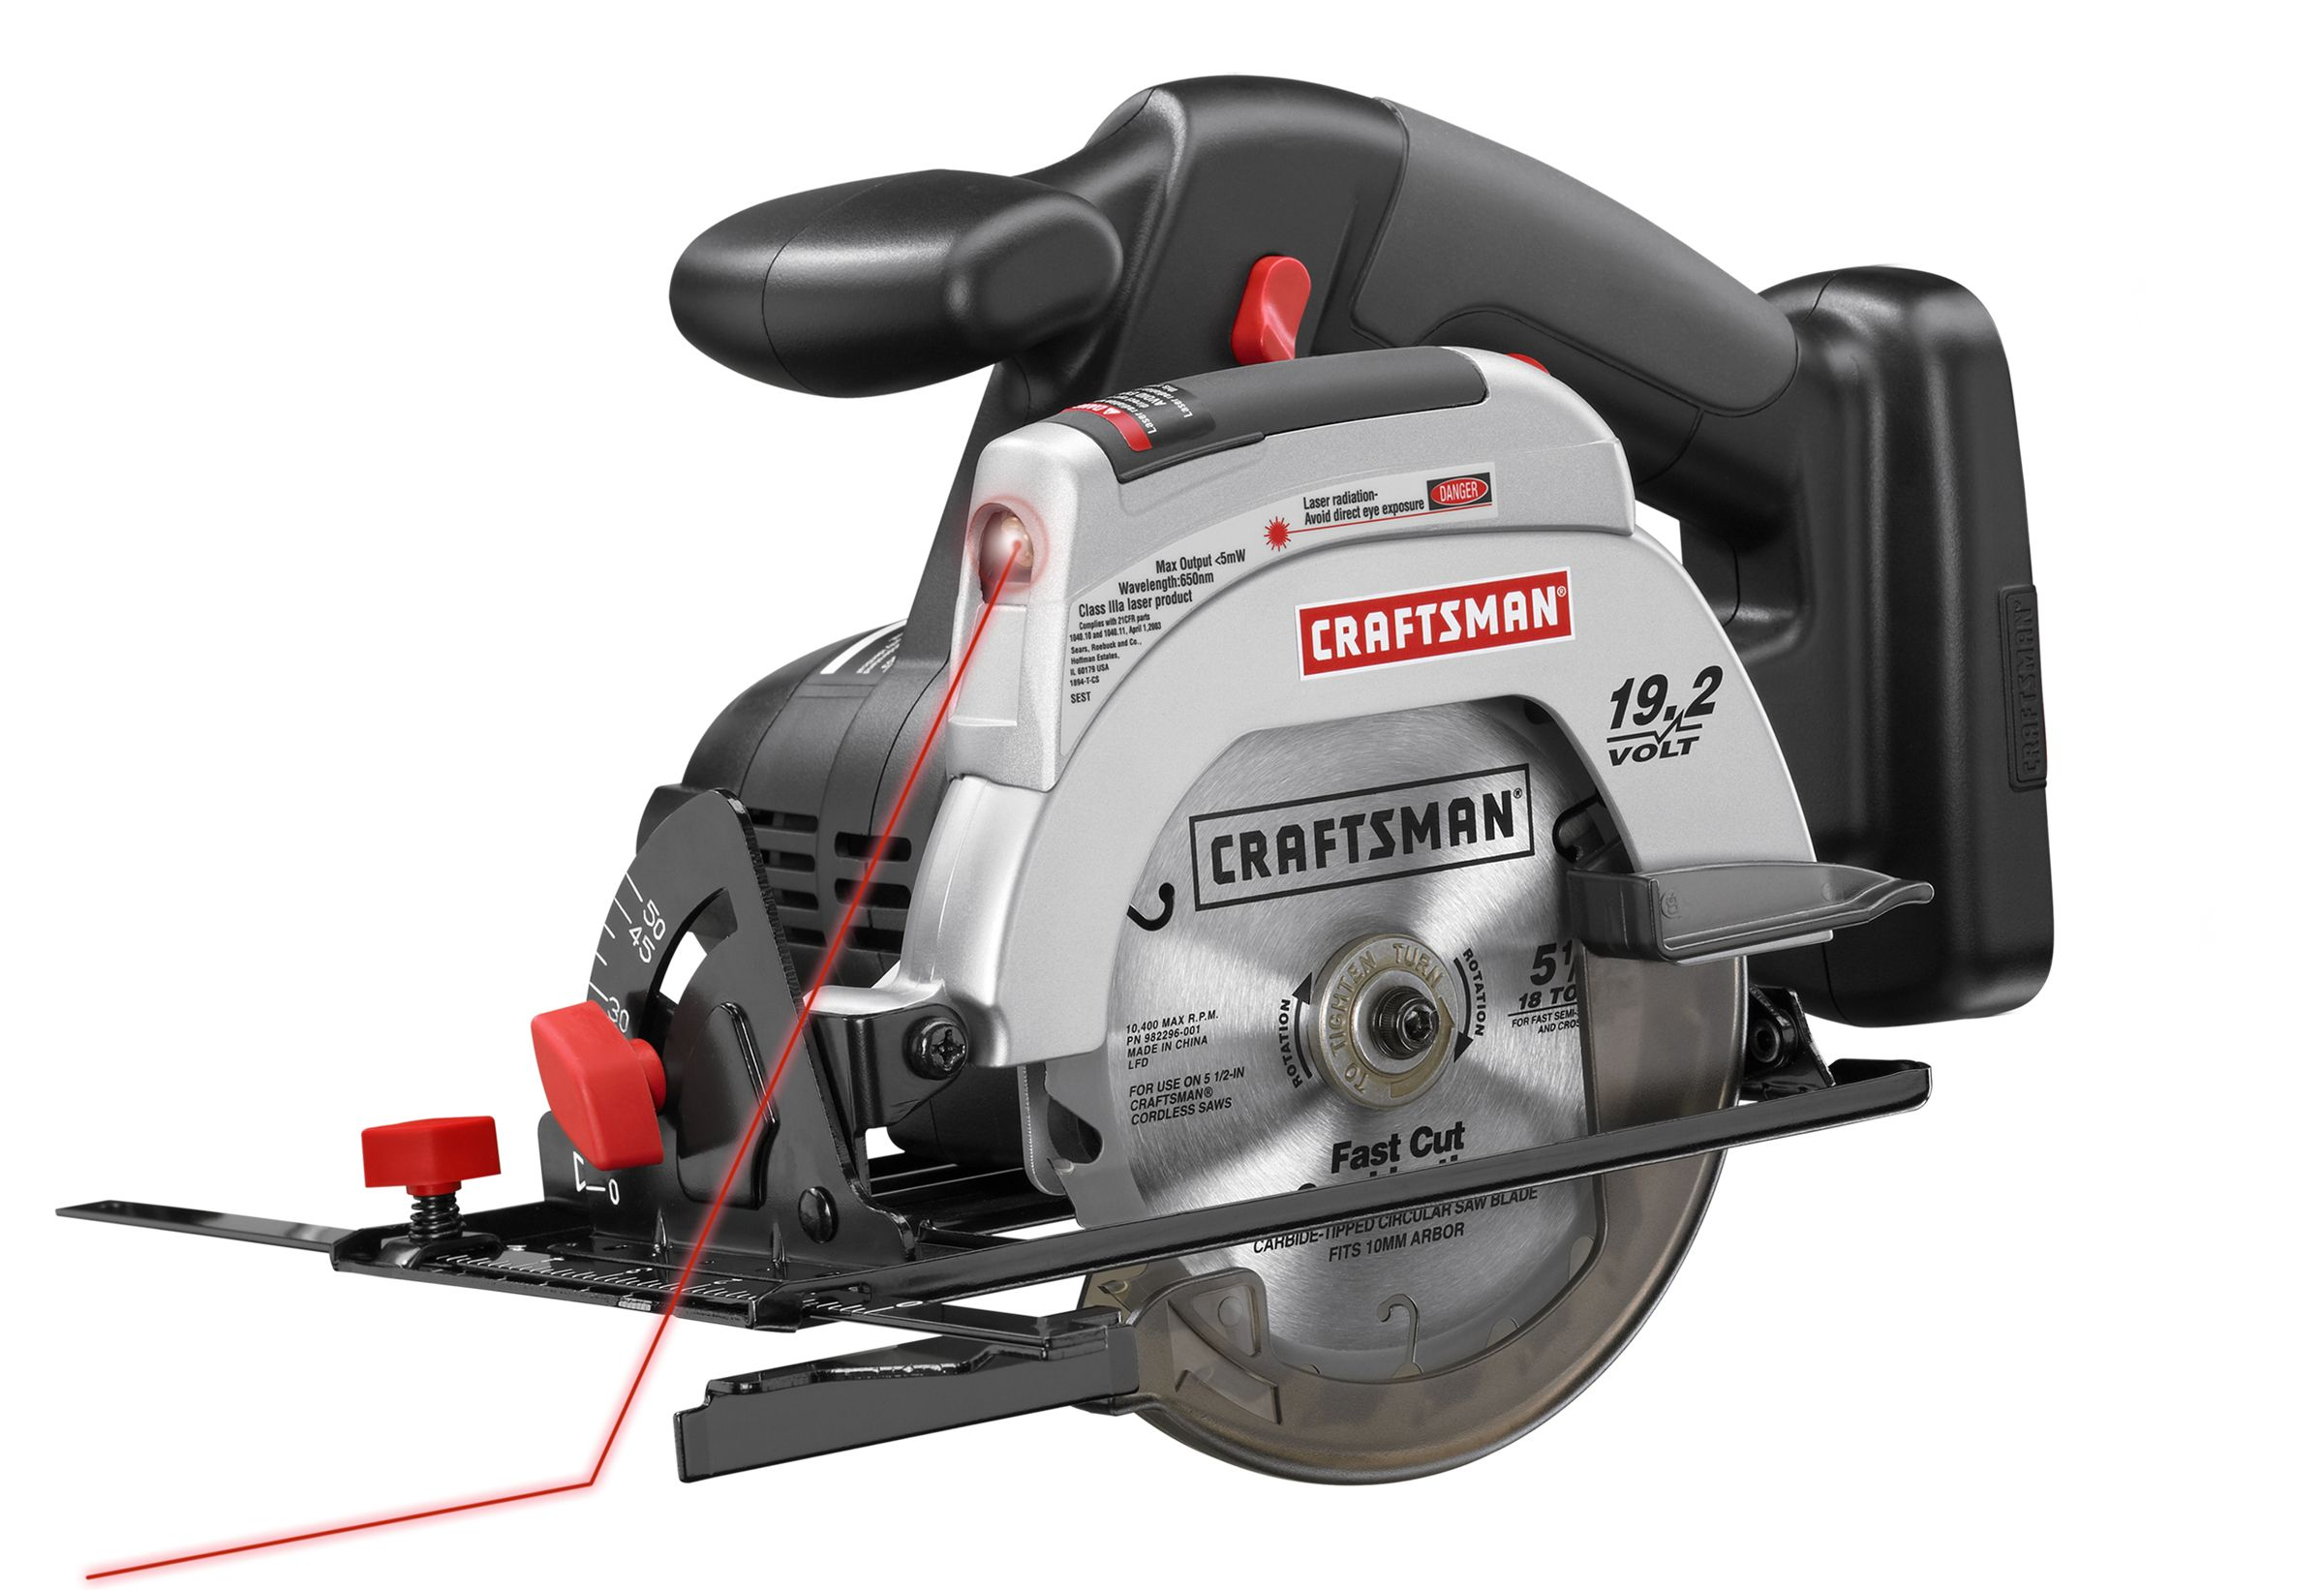 Craftsman C3 19.2 Volt Cordless 5 1/2 inch Trim Saw